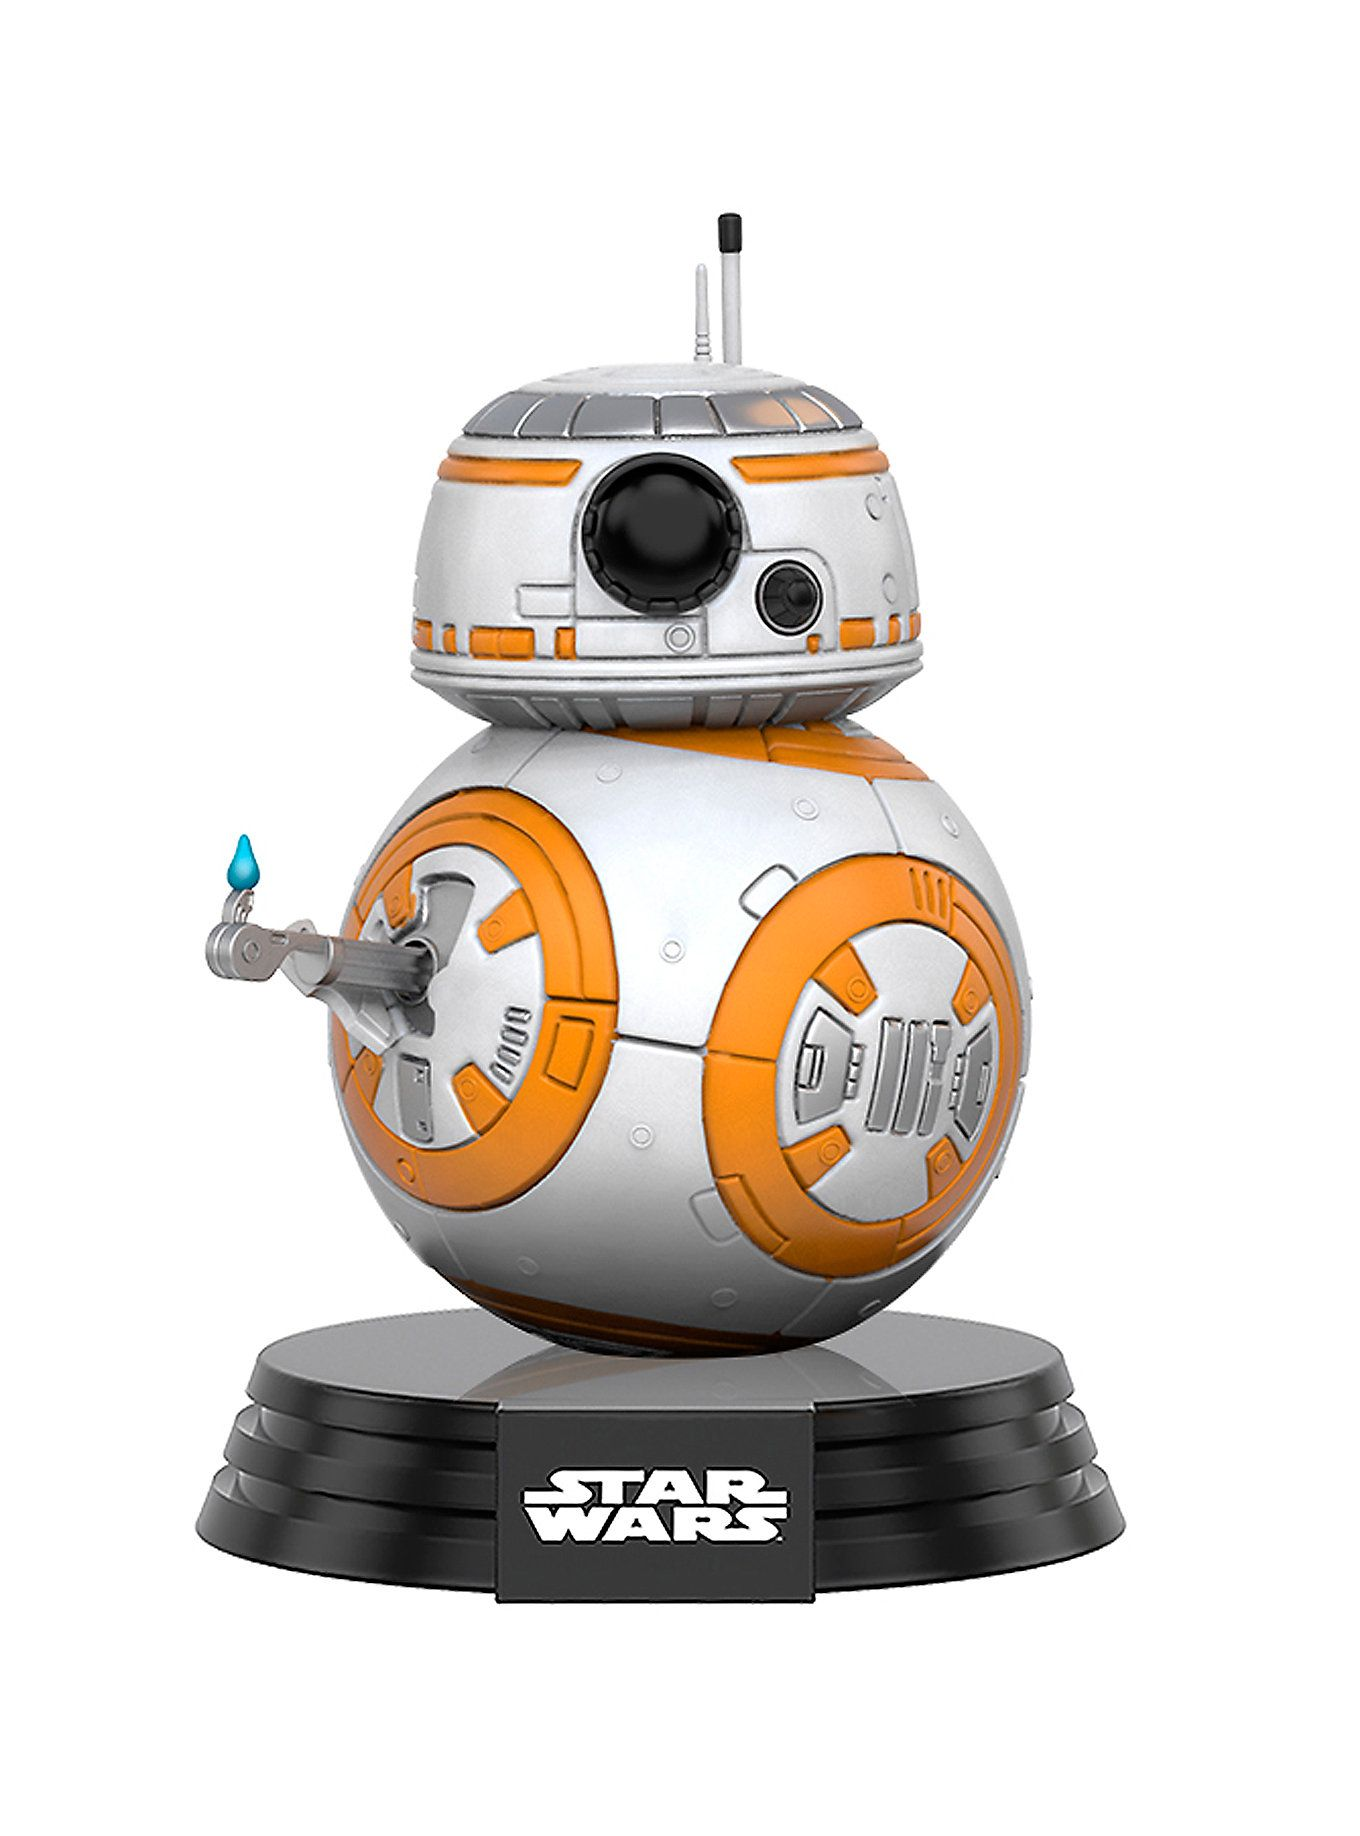 Funko Star Wars Pop Bb 8 Thumbs Up Vinyl Bobble Head 2016 Summer Convention Exclusive Funko Pop Star Wars Vinyl Figures Star Wars